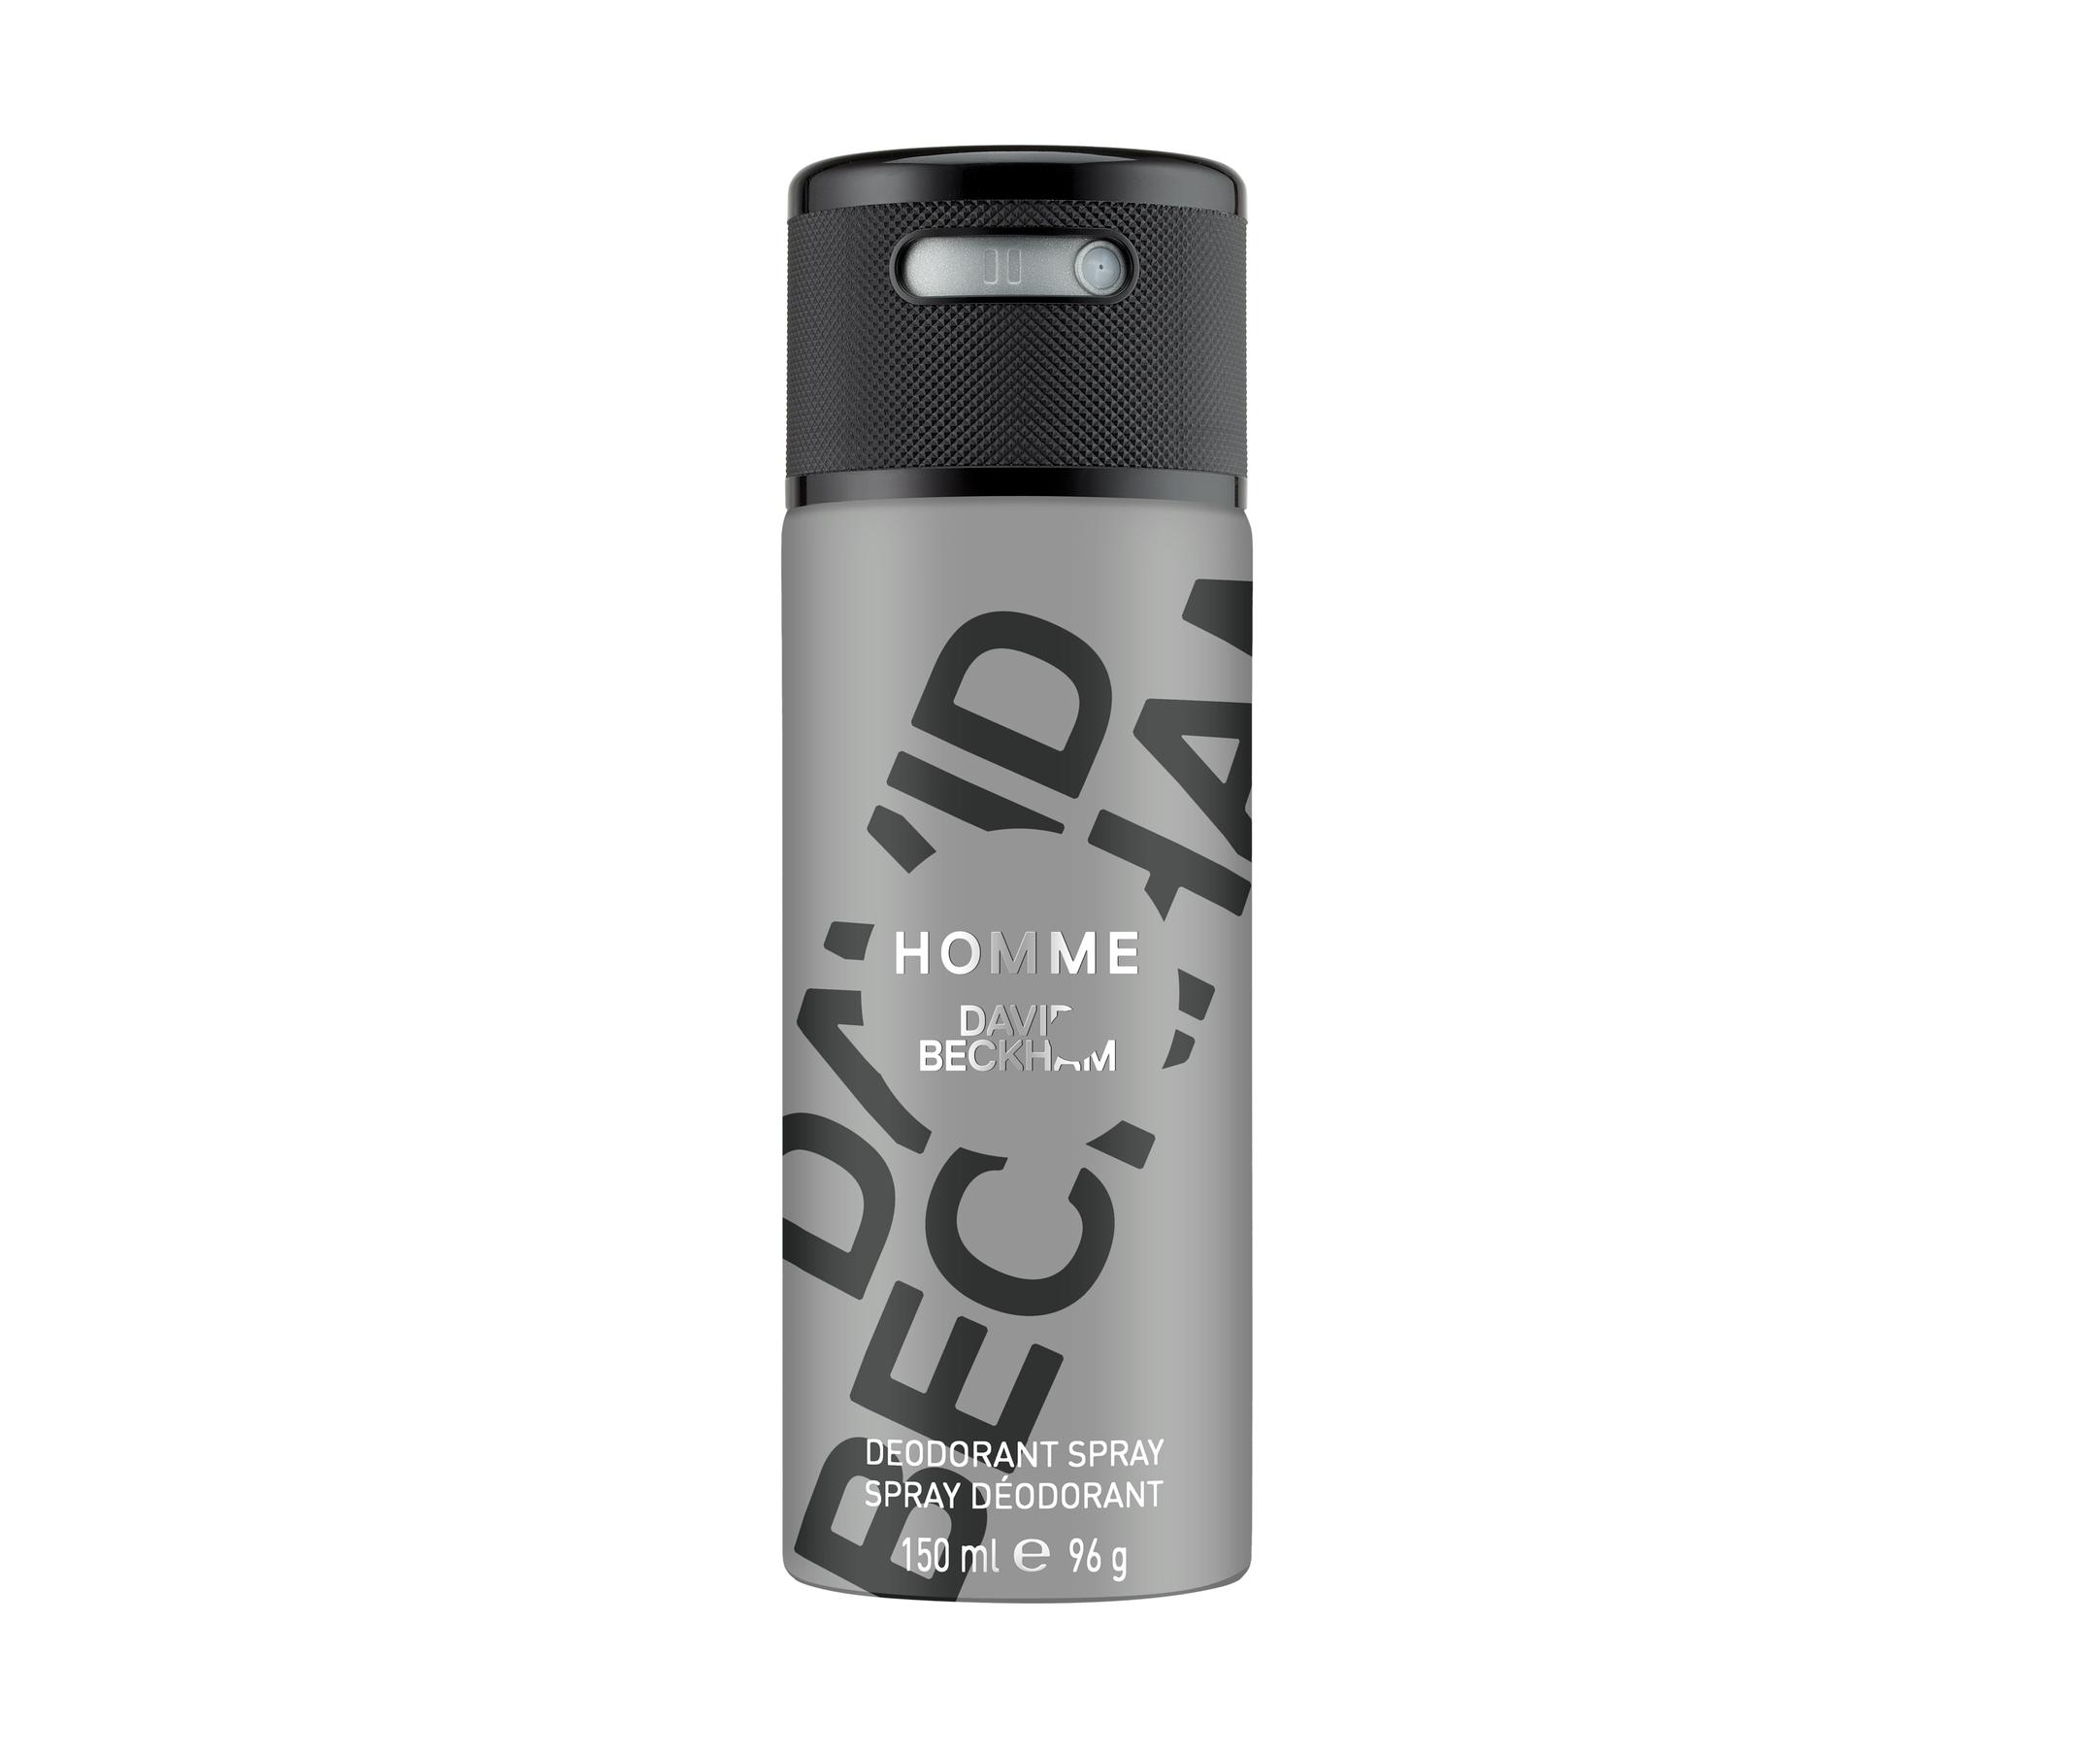 David Beckham - Homme - Deodorant Spray 150 ml